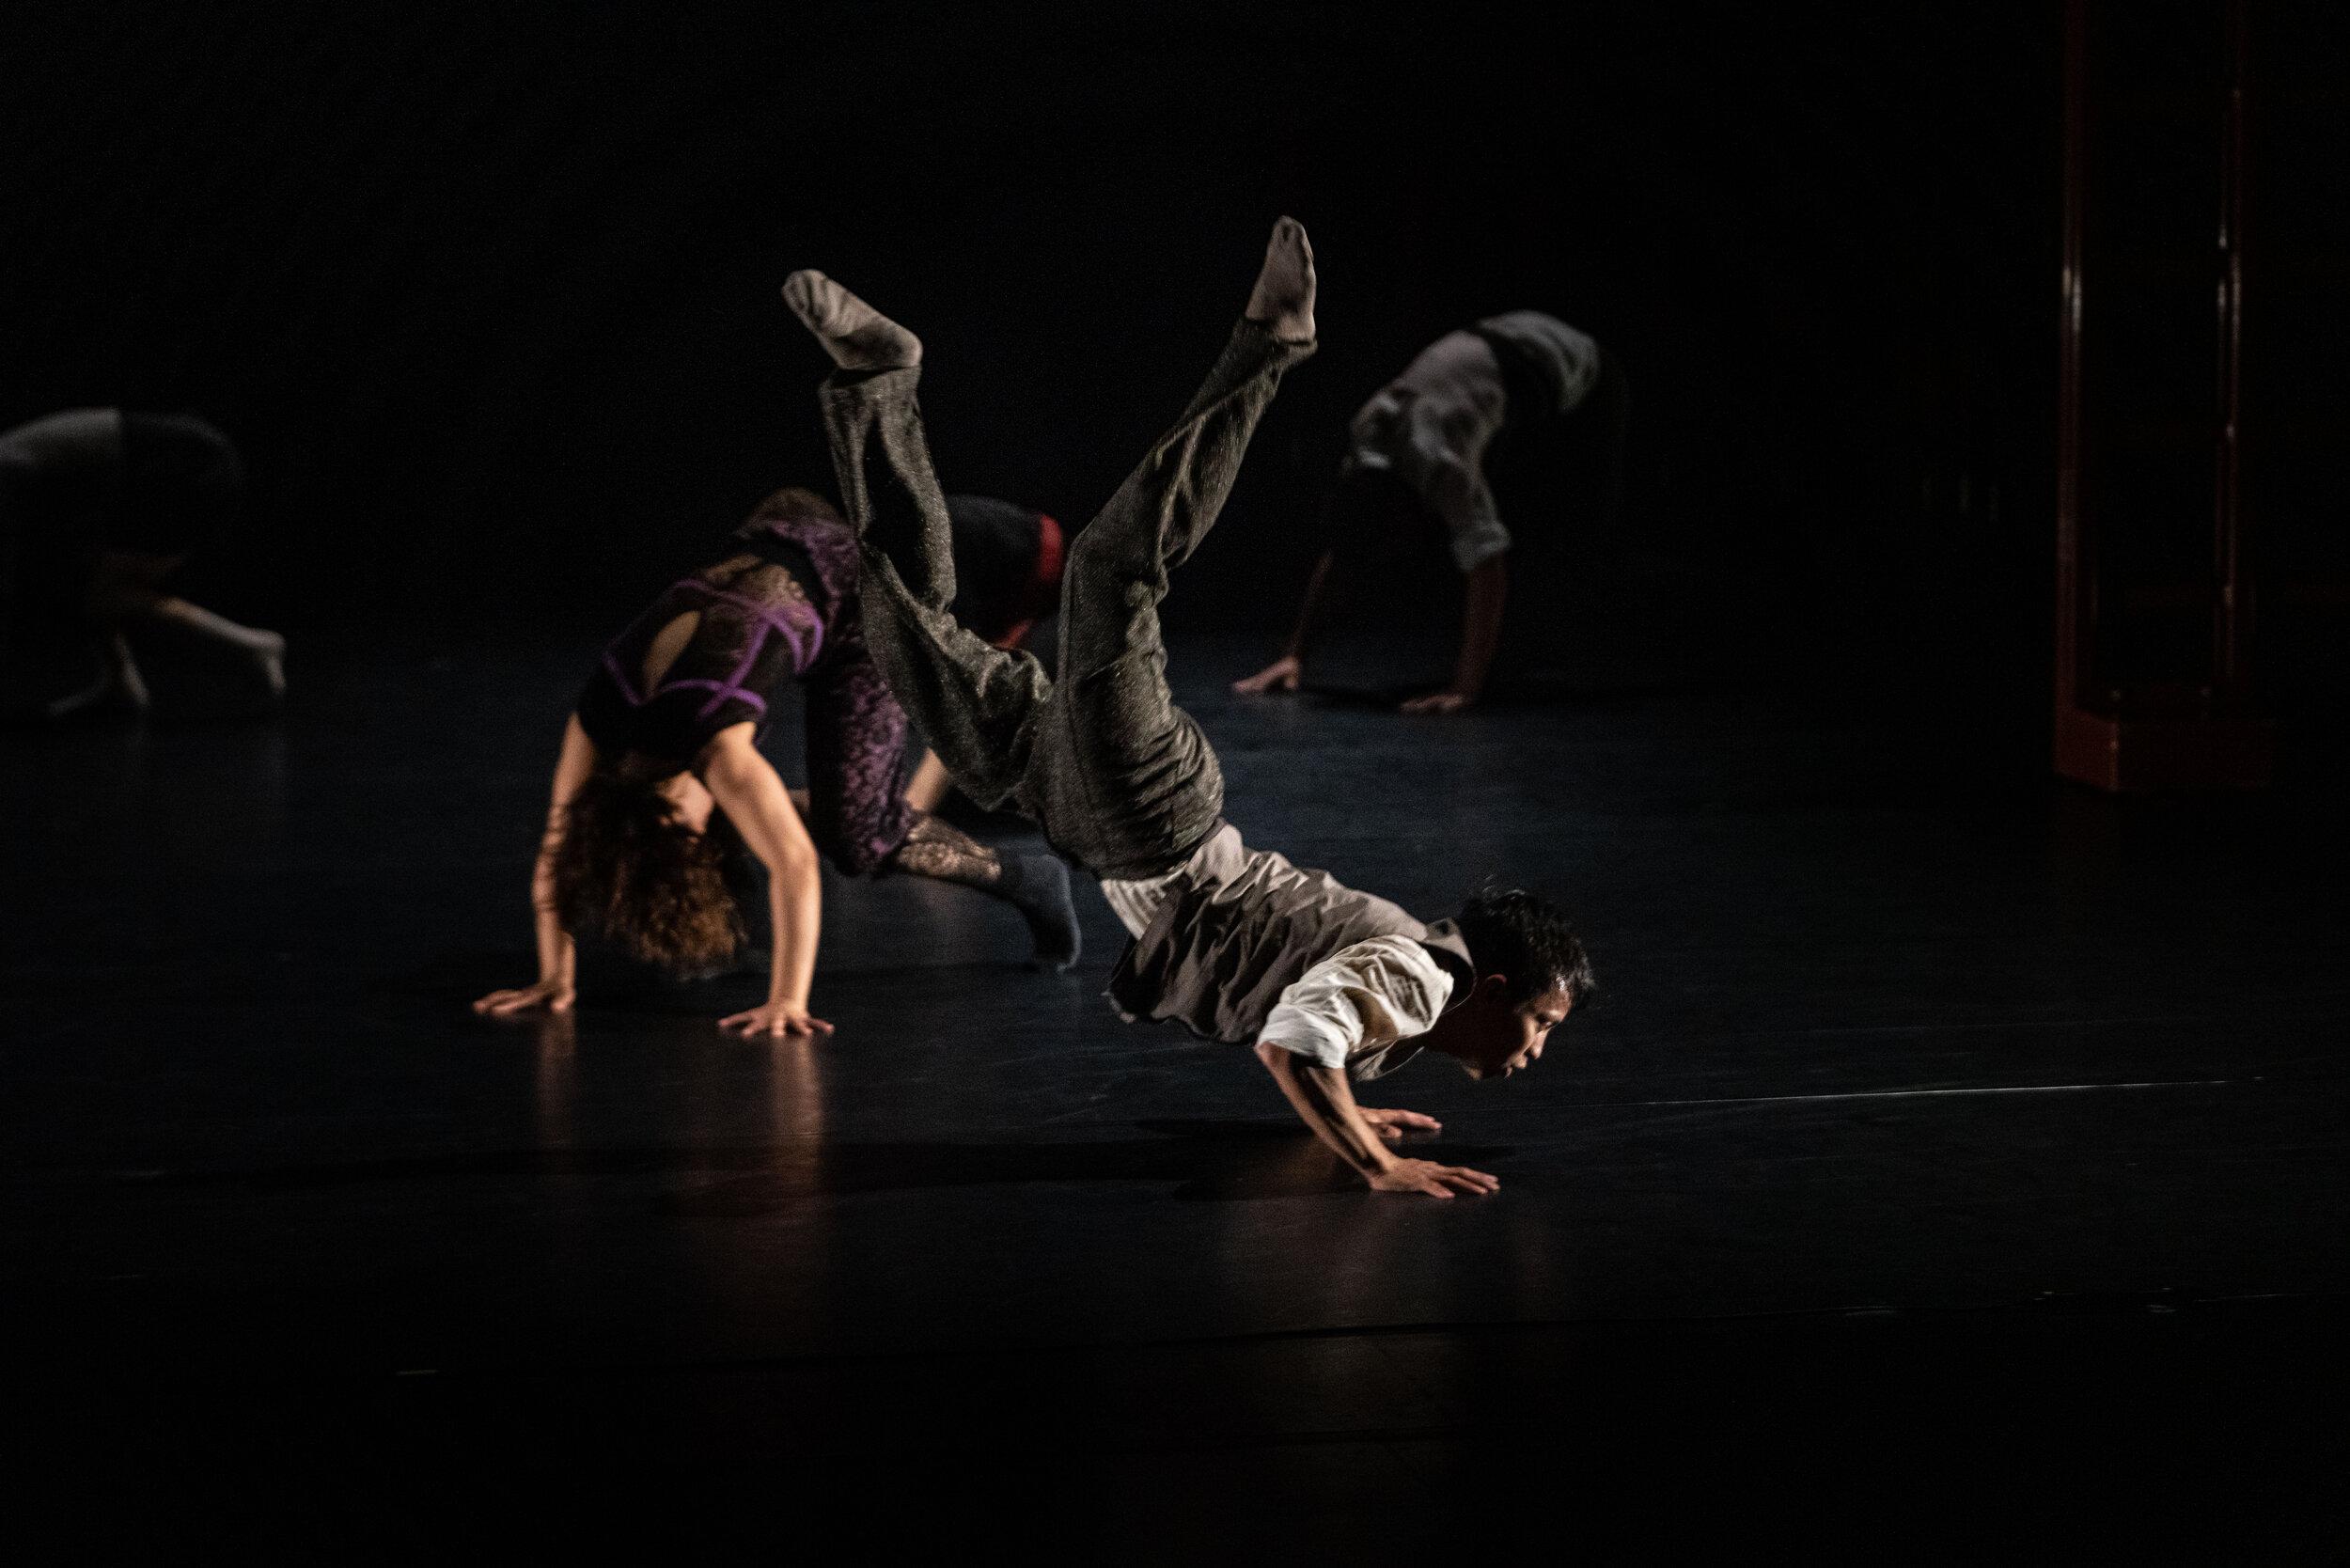 Jon Filip Fahlstrøm - CODACLASSRom for Dans / PRODA